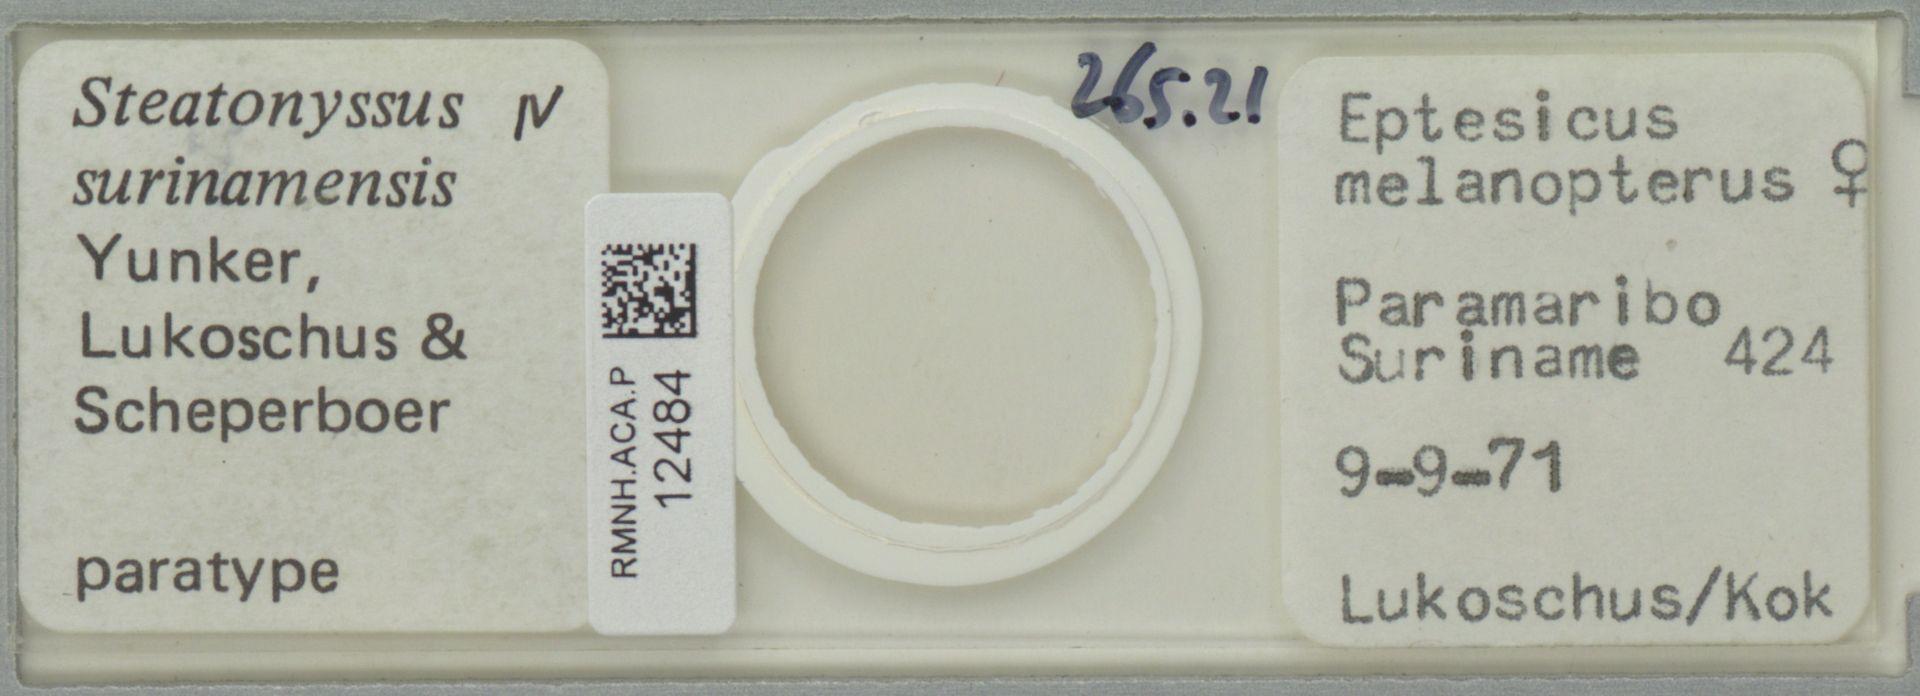 RMNH.ACA.P.12484 | Steatonyssus surinamensis